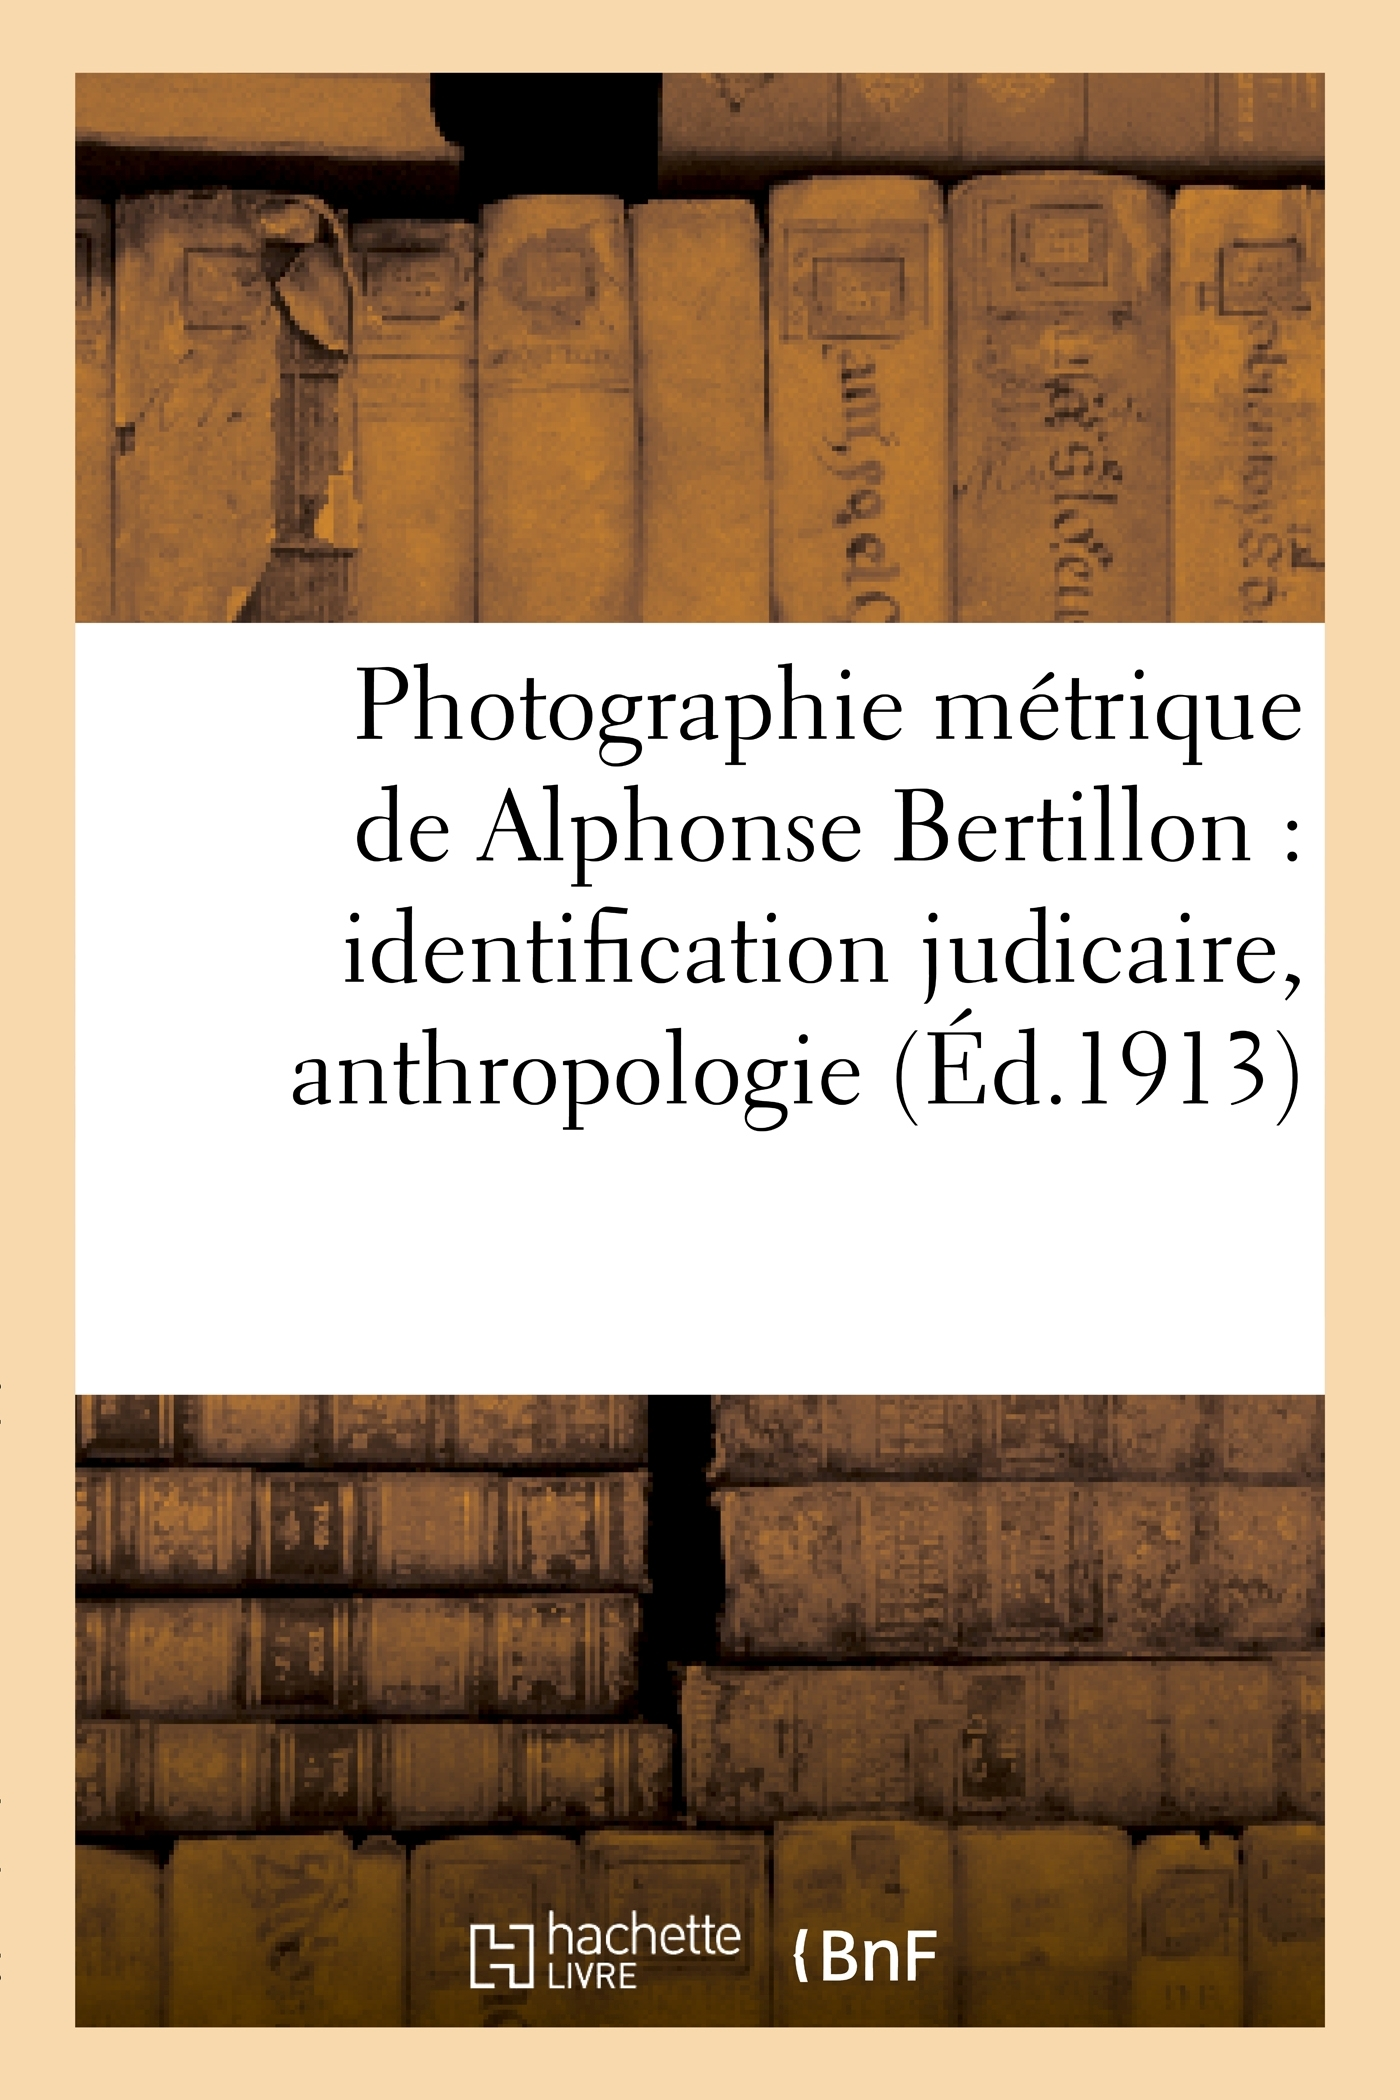 PHOTOGRAPHIE METRIQUE DE ALPHONSE BERTILLON : IDENTIFICATION JUDICAIRE, ANTHROPOLOGIE - , ARCHEOLOGI